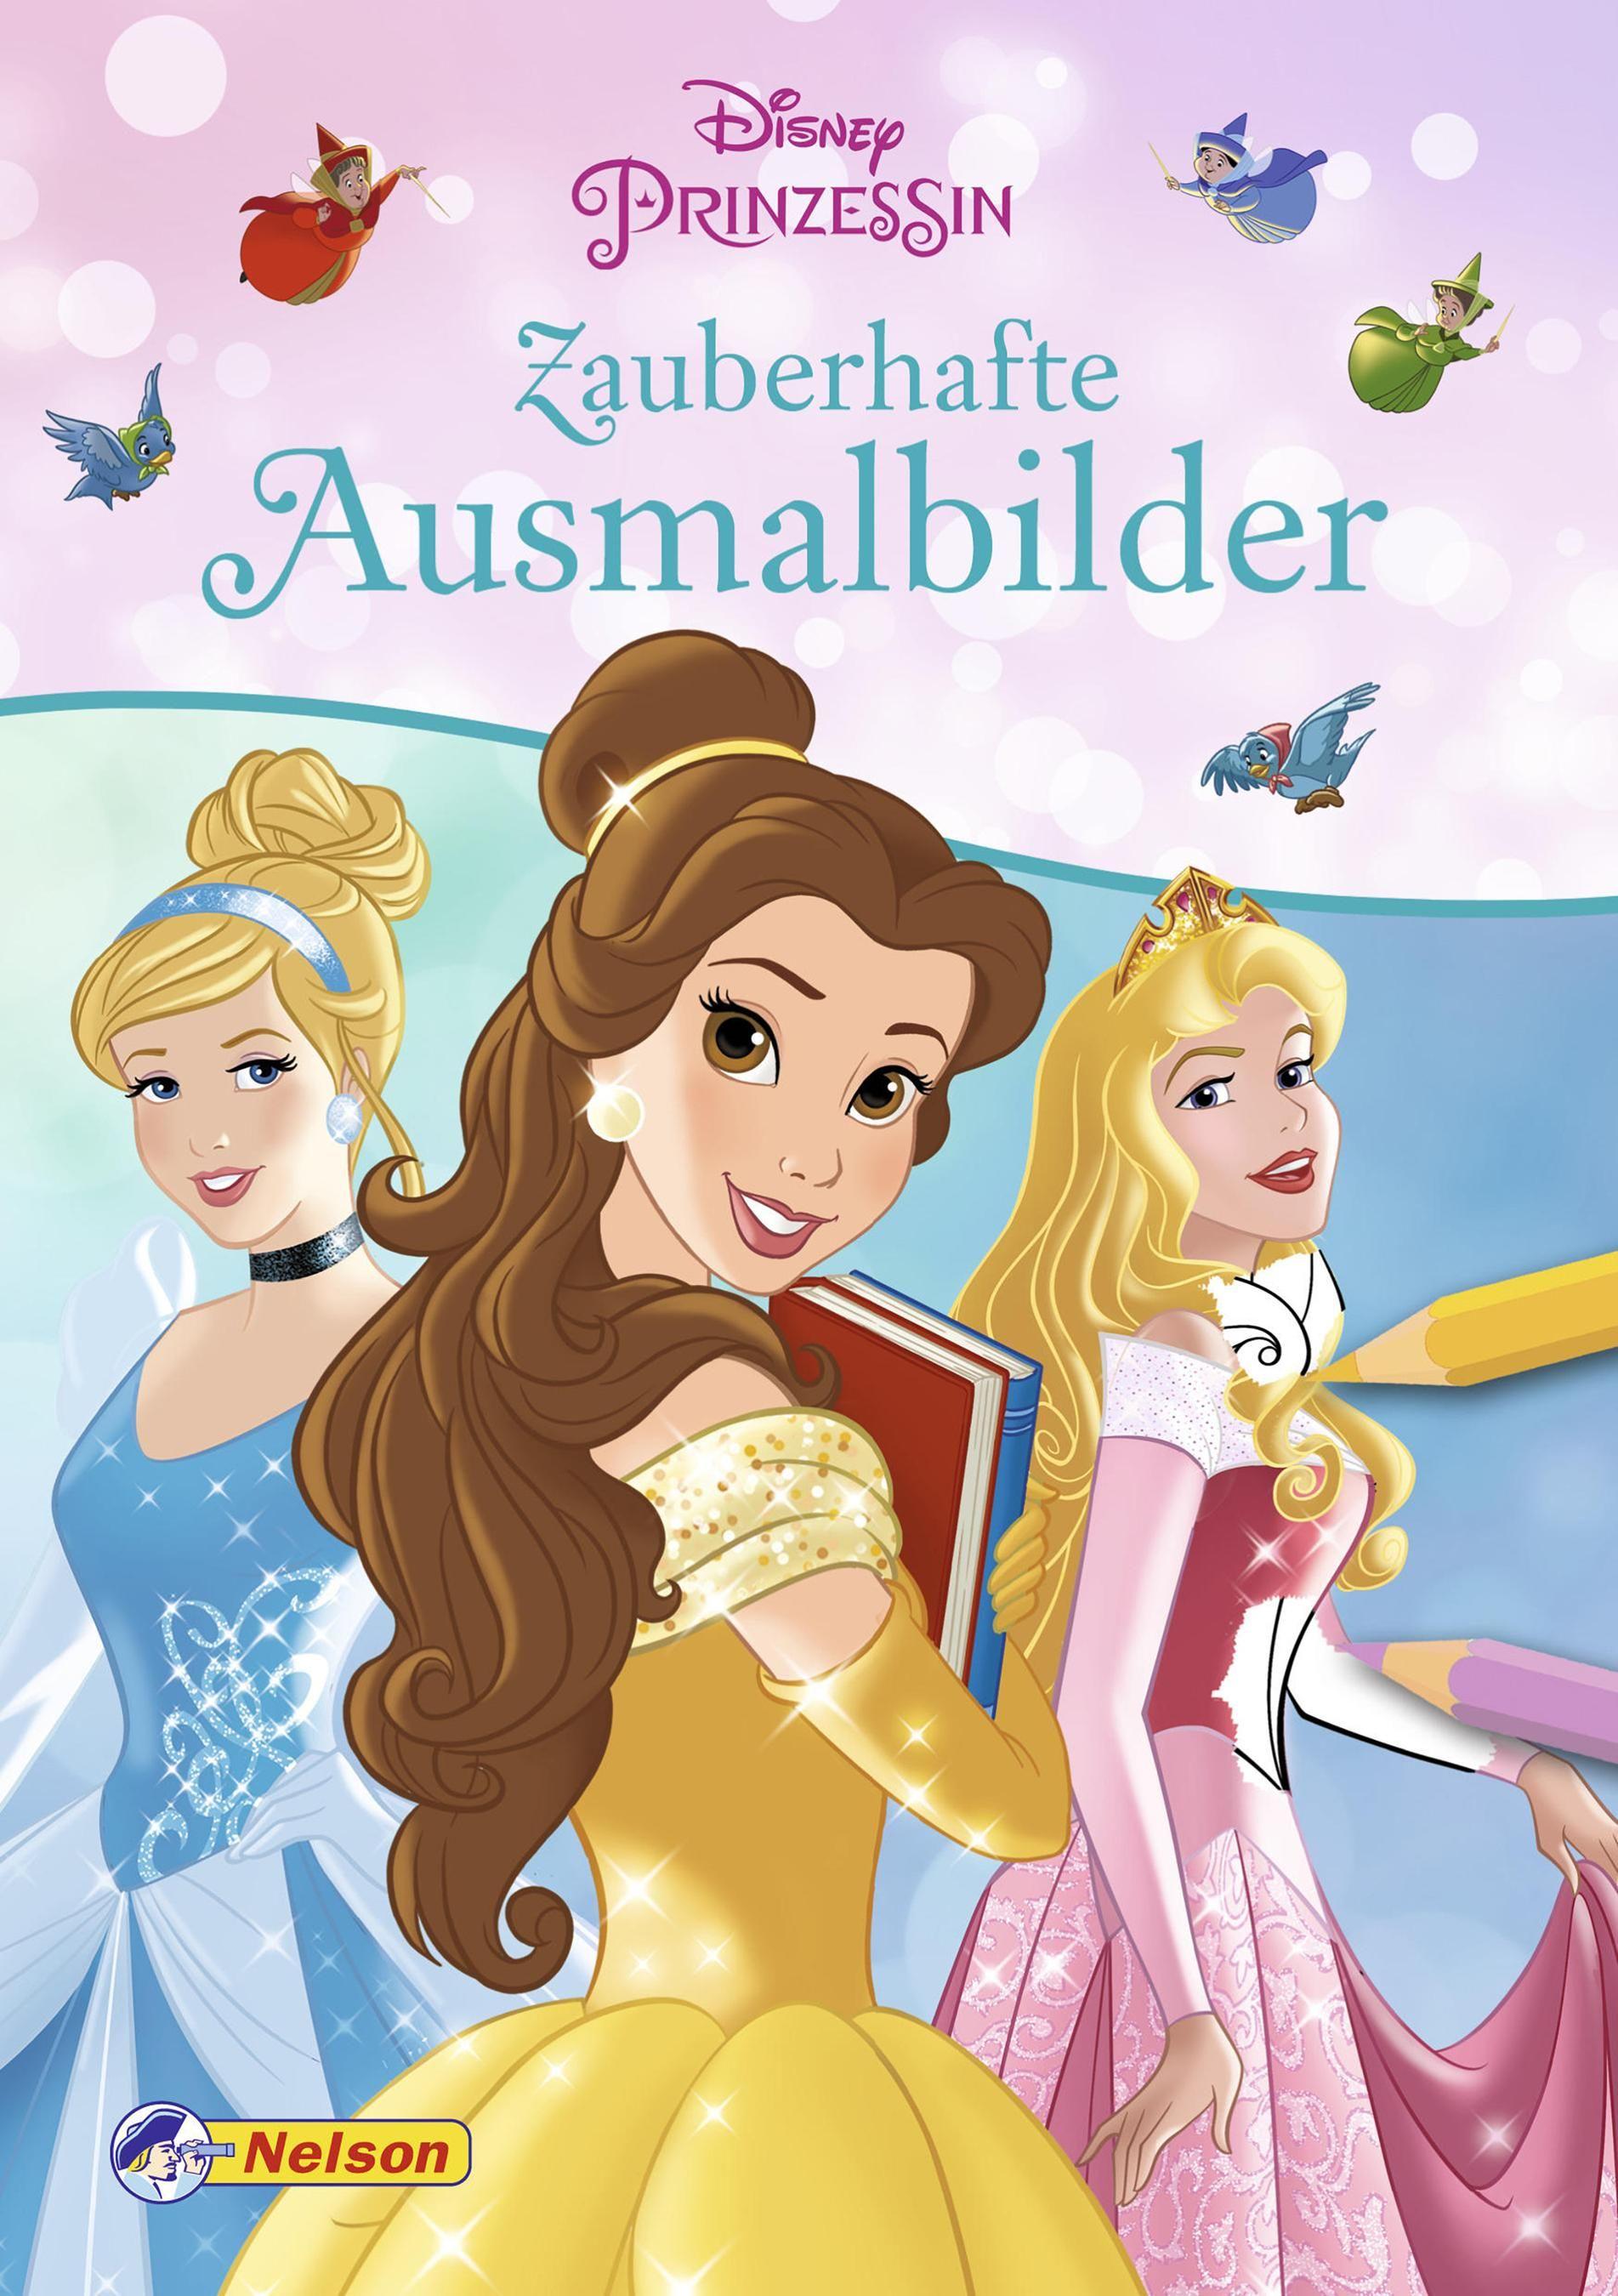 Disney Prinzessin Ausmalbilder : Disney Prinzessin Zauberhafte Ausmalbilder 9783845108292 Ebay